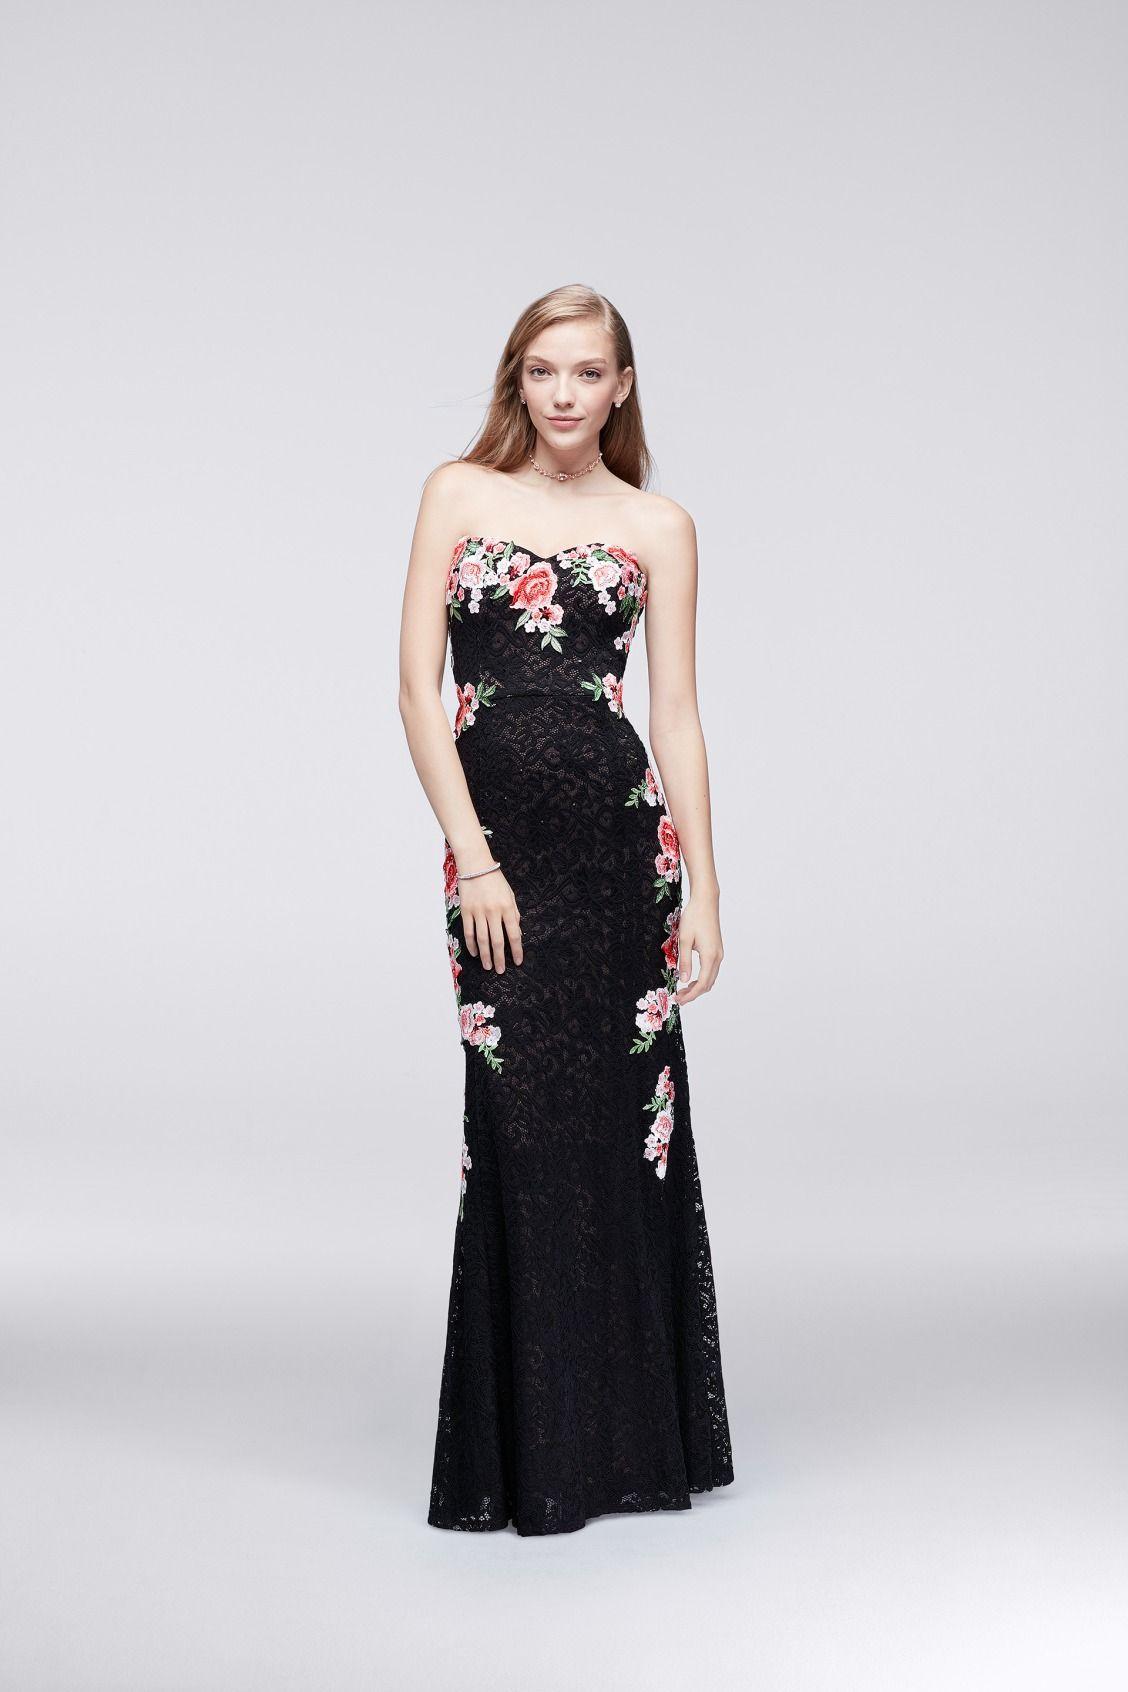 David Bridal Prom Gowns